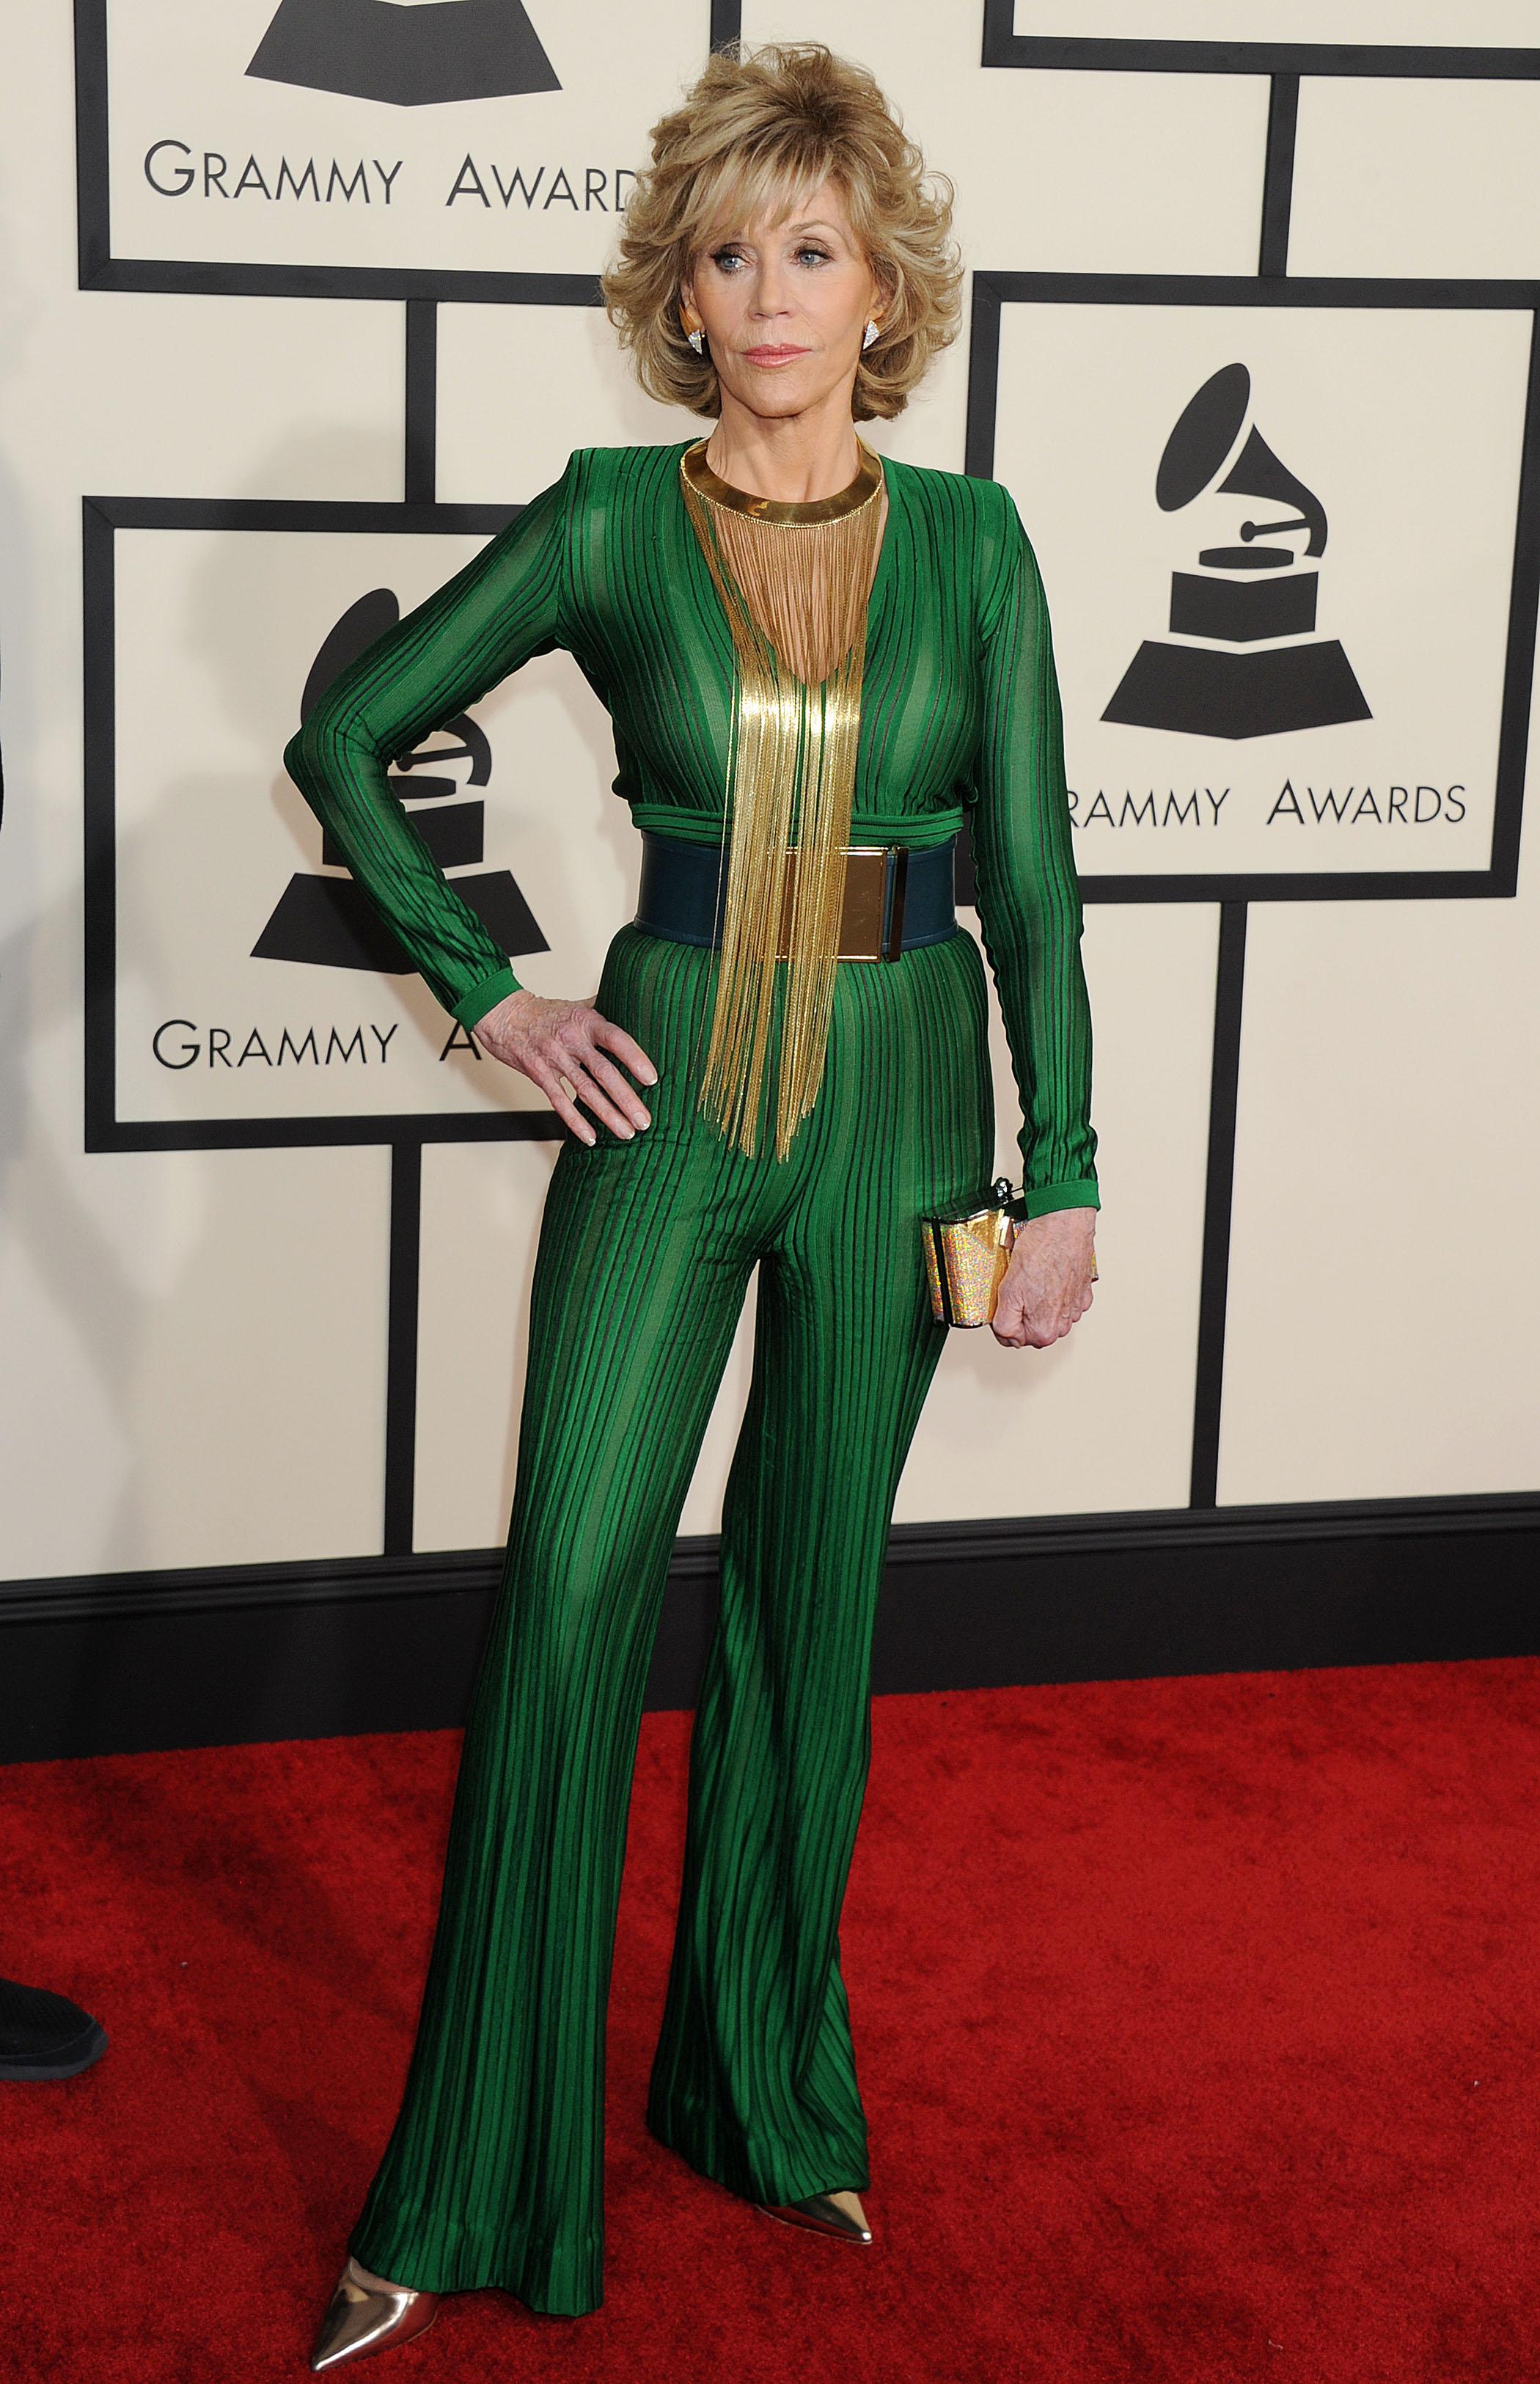 Grammys Well Played: Jane Fonda in Balmain